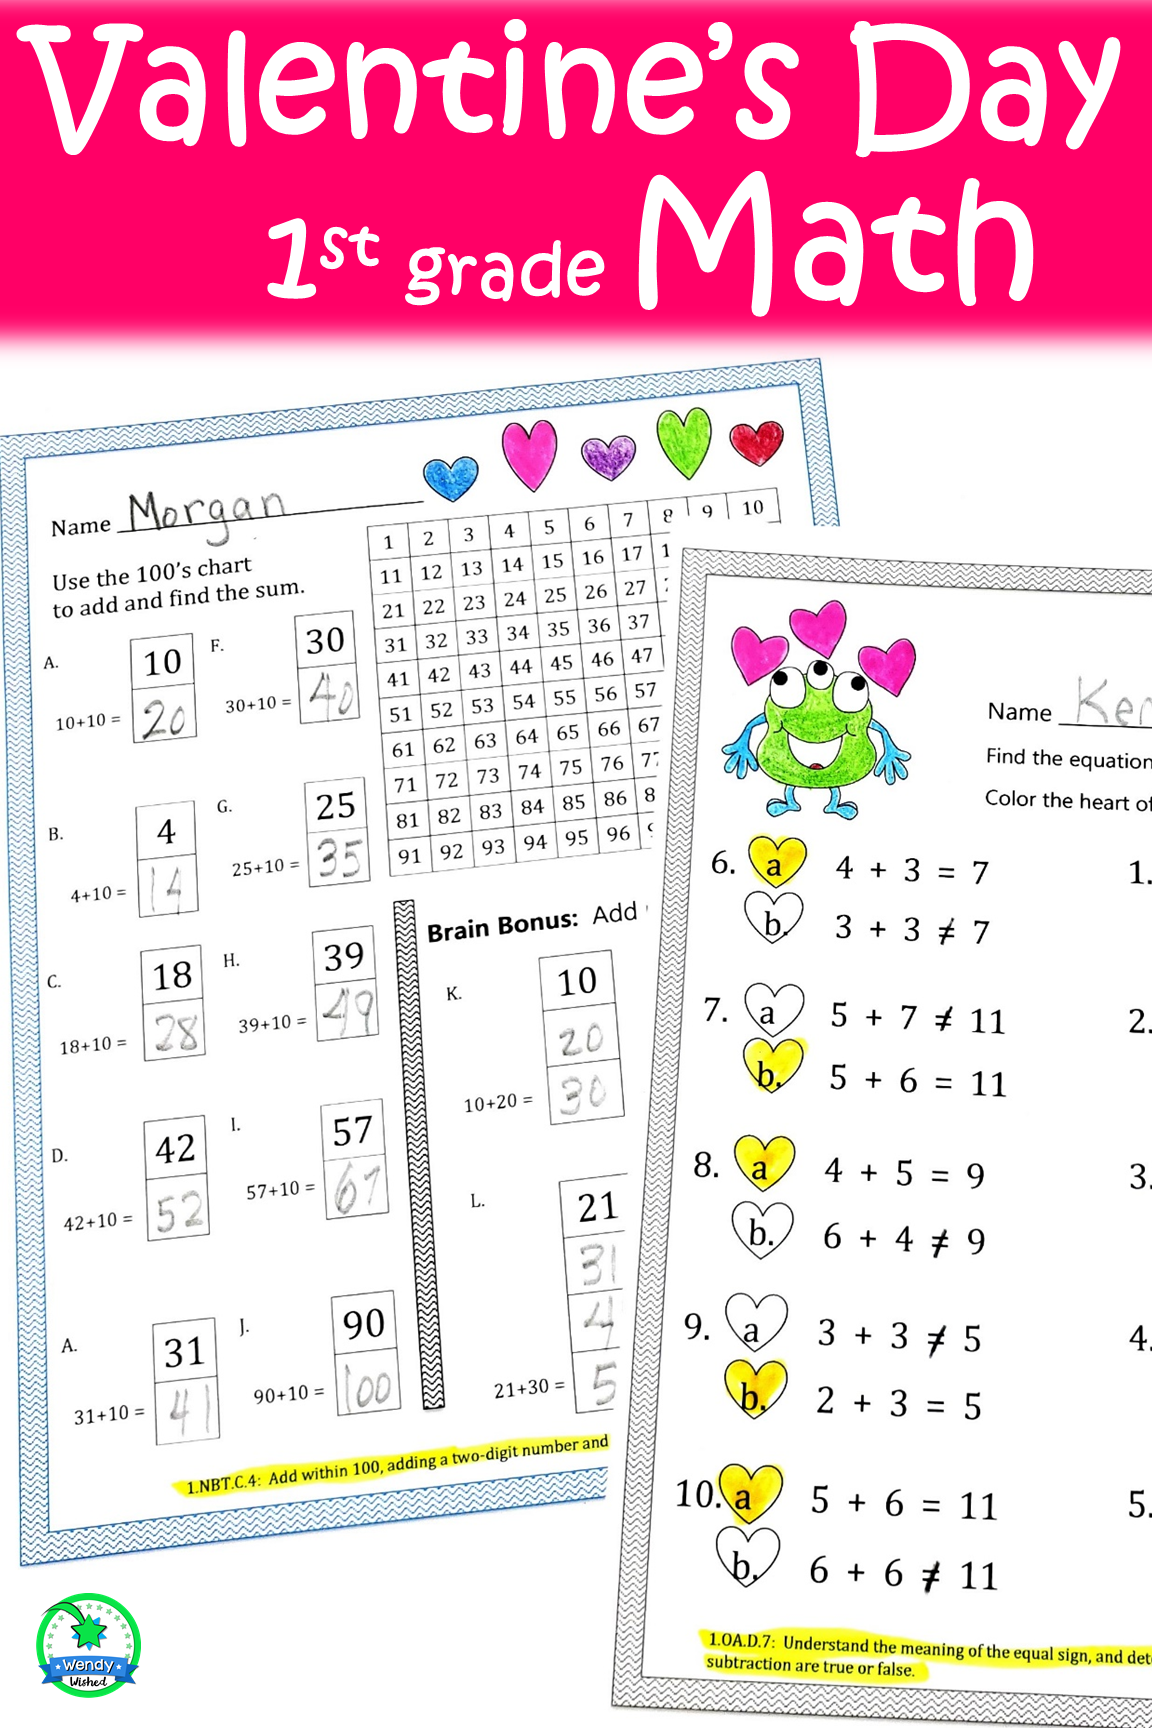 medium resolution of Valentine's Day Math Worksheets for 1st Grade   Math